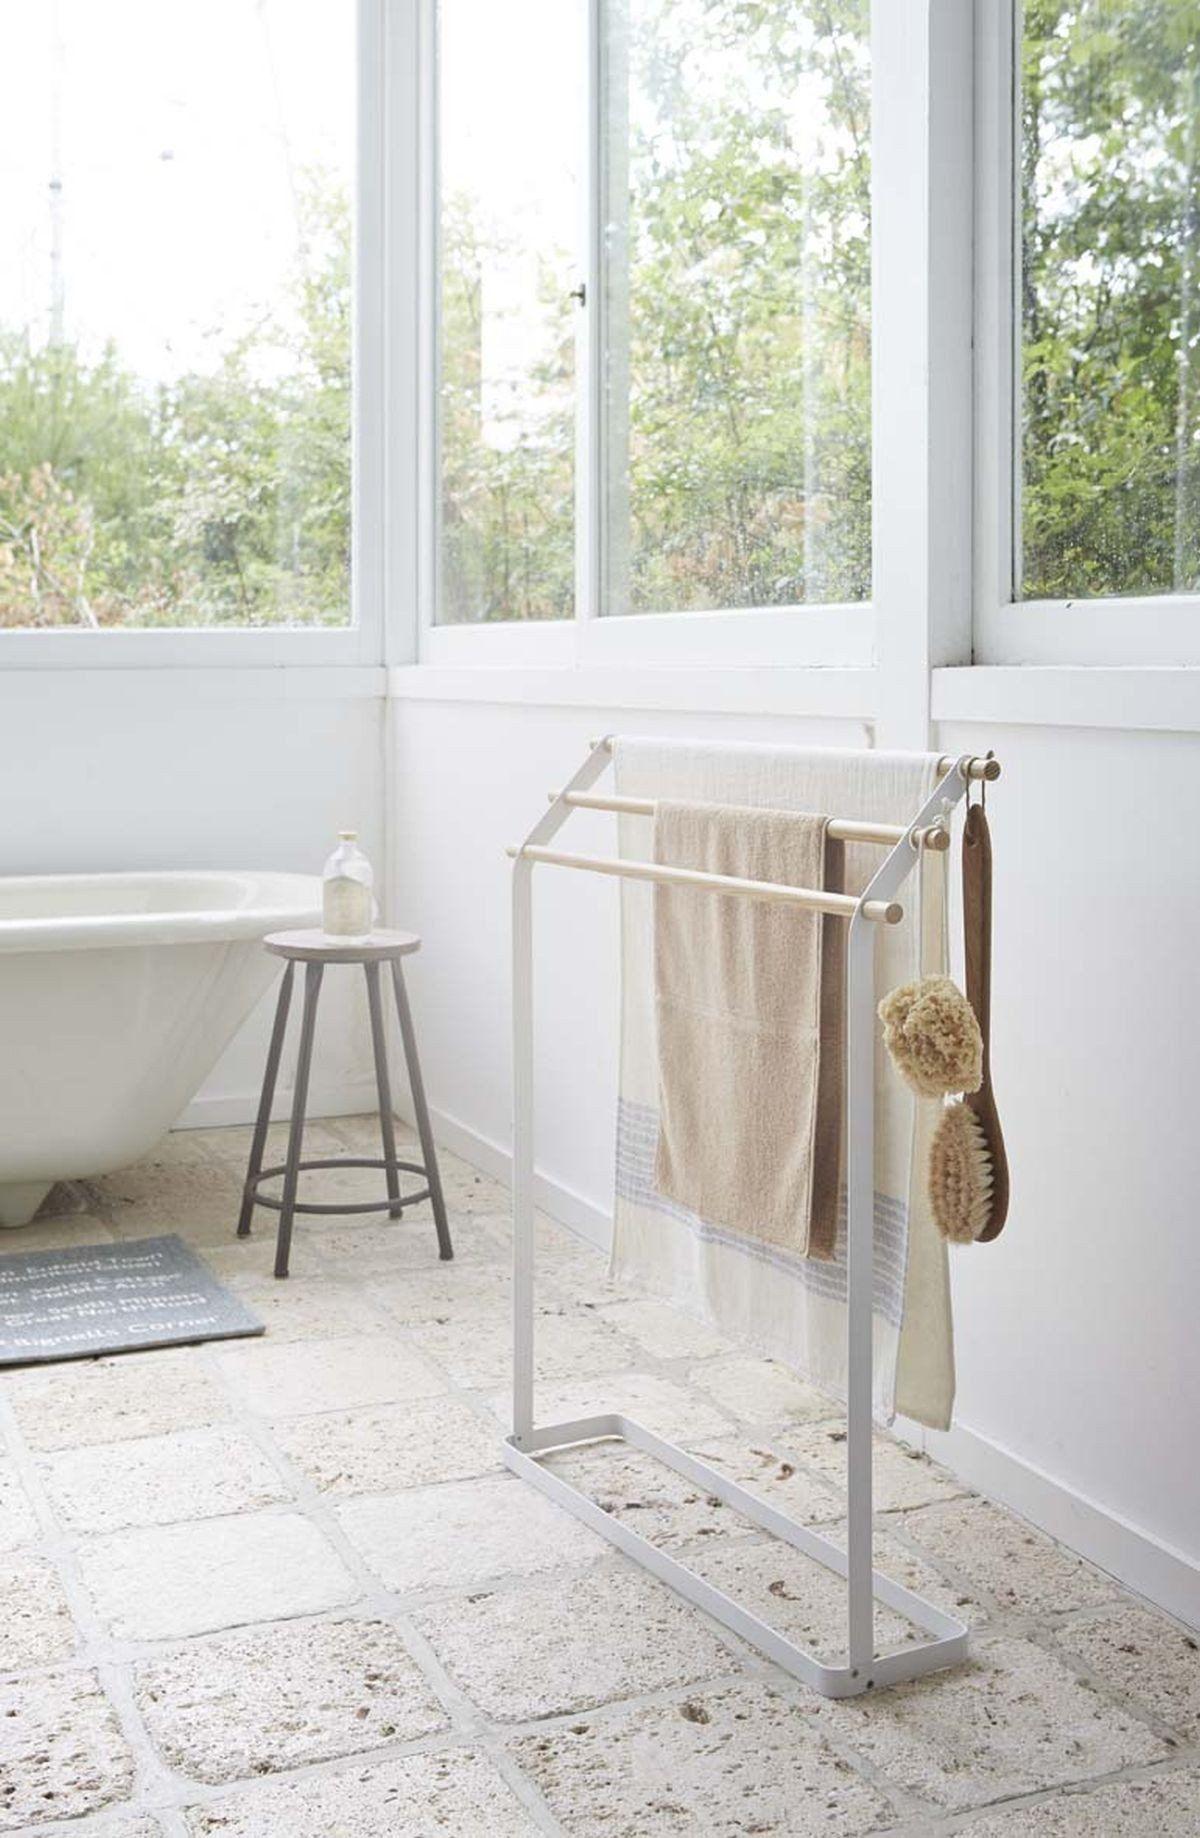 Tosca Bath Towel Hanger in White design by Yamazaki | Hanger, Towels ...